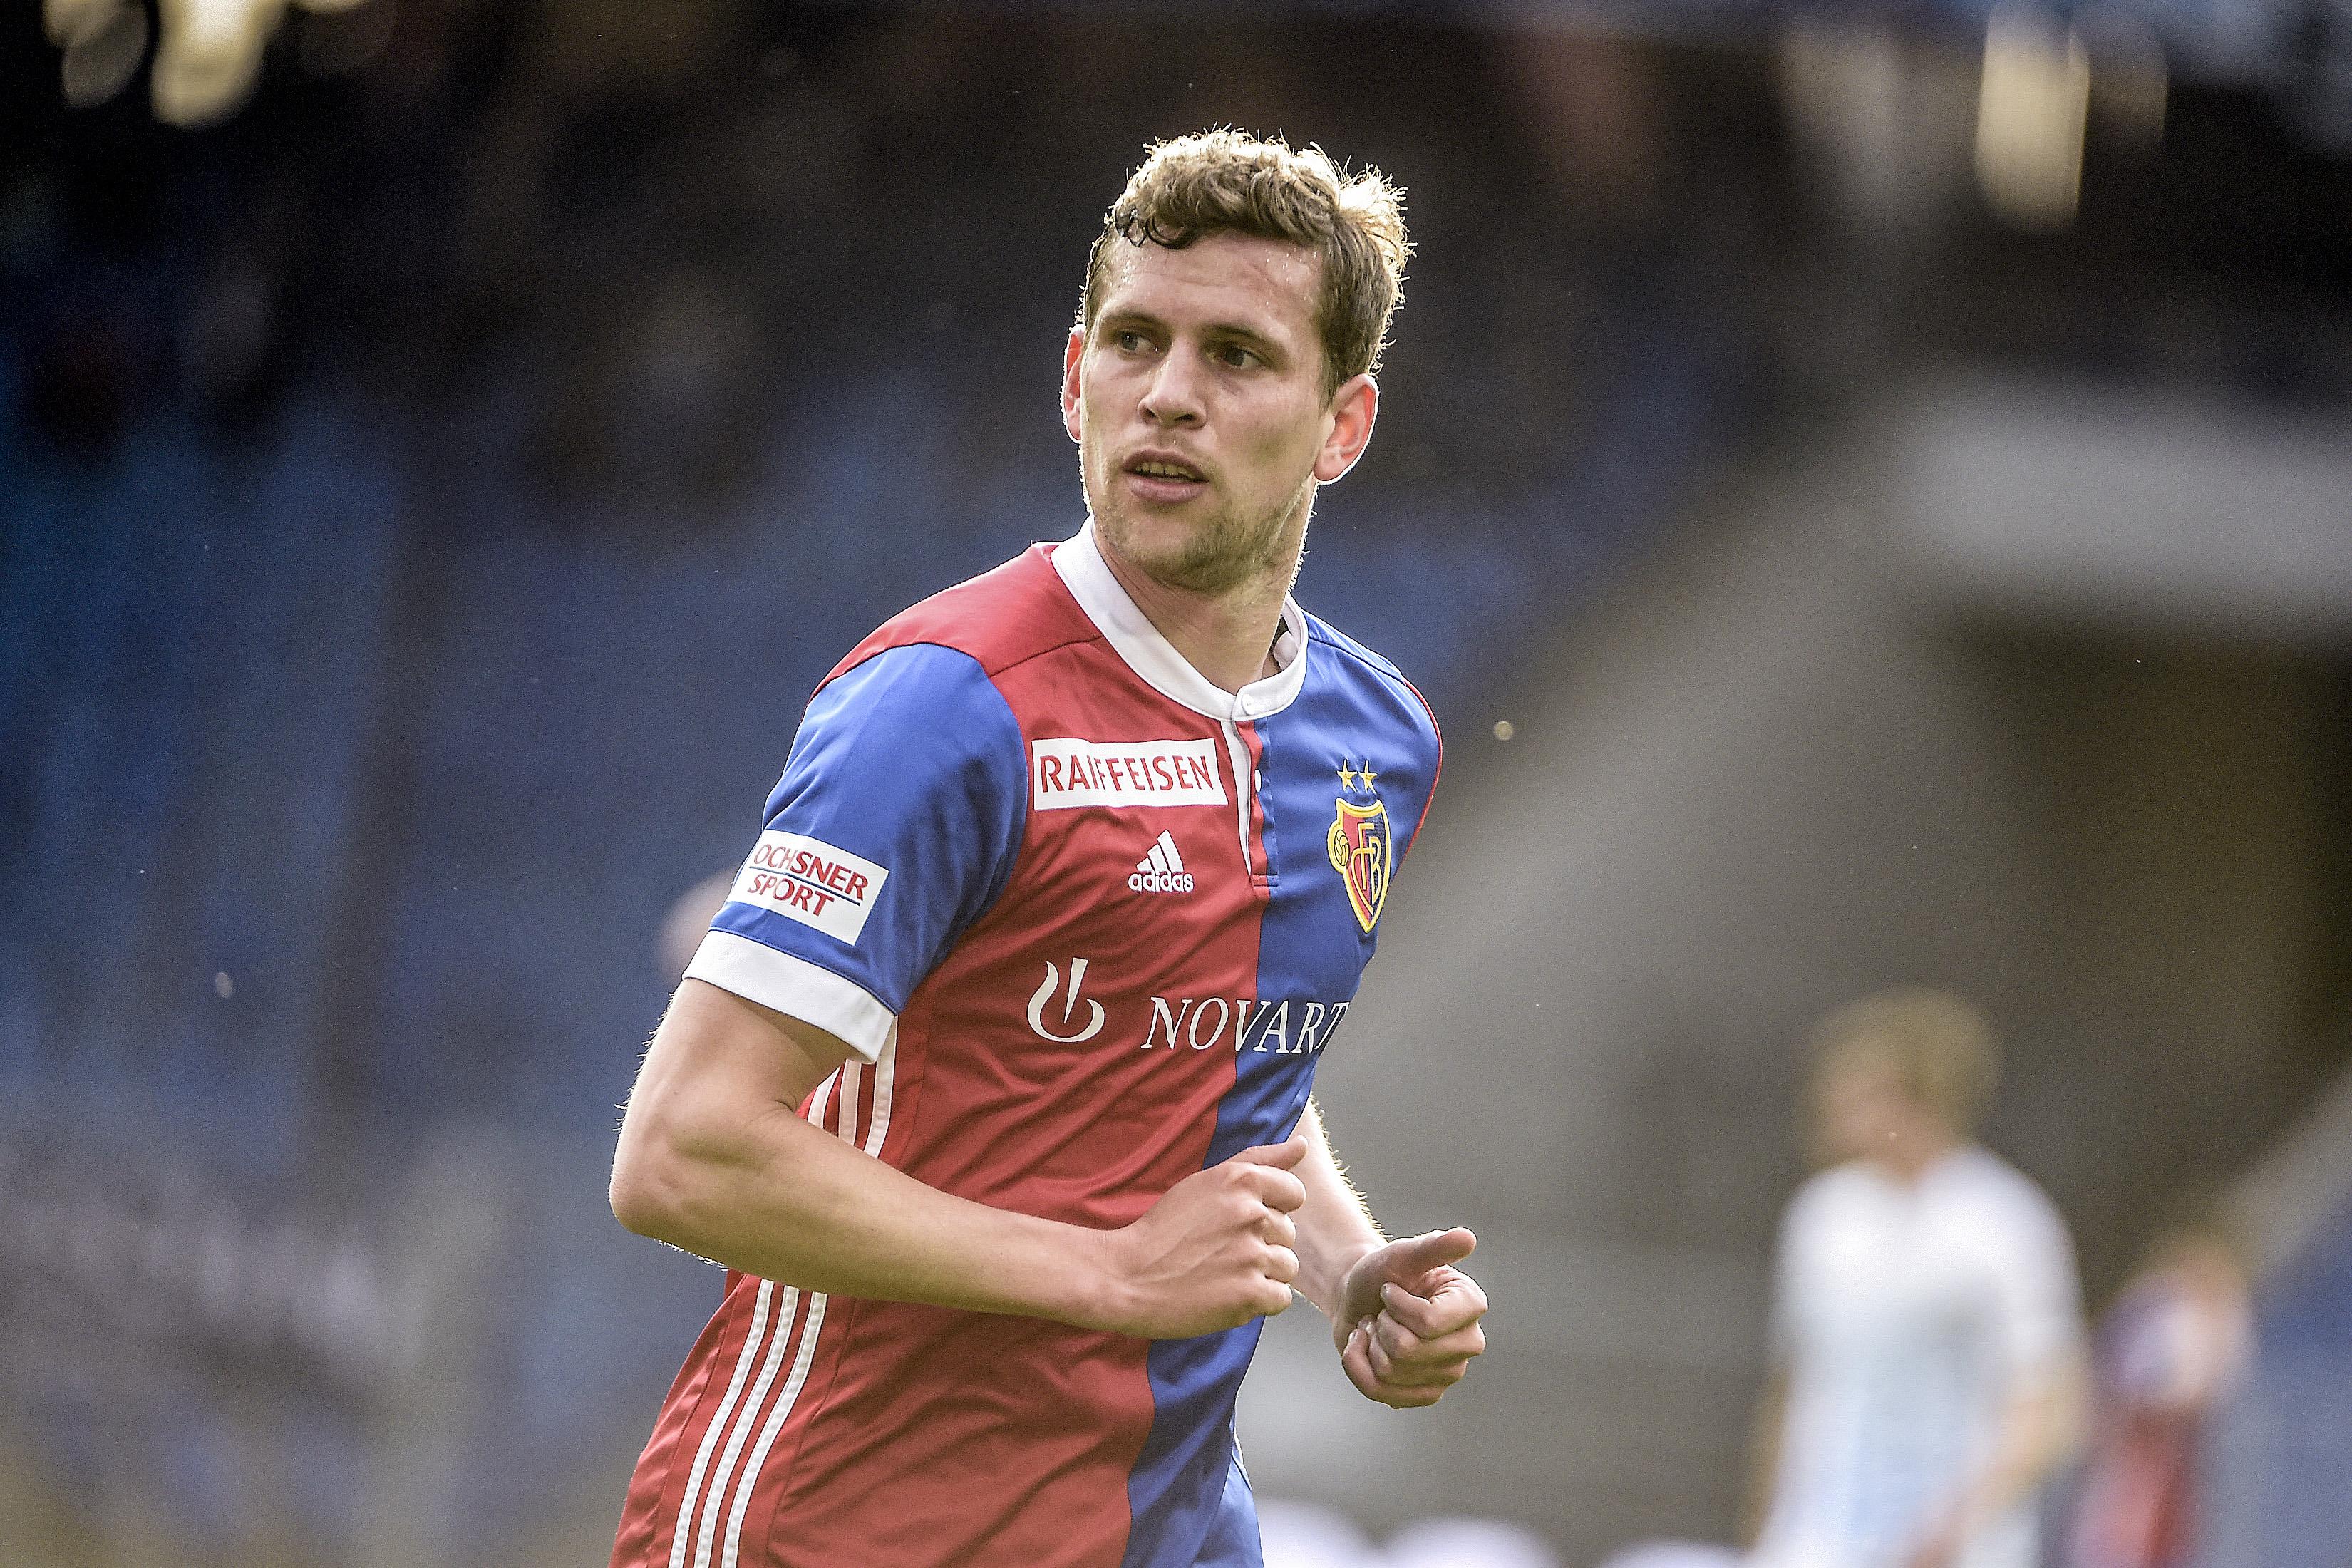 11.04.2018; Basel; Fussball Super League - FC Basel - FC Zuerich; Fabian Frei (Basel) (Daniela Frutiger/freshfocus)